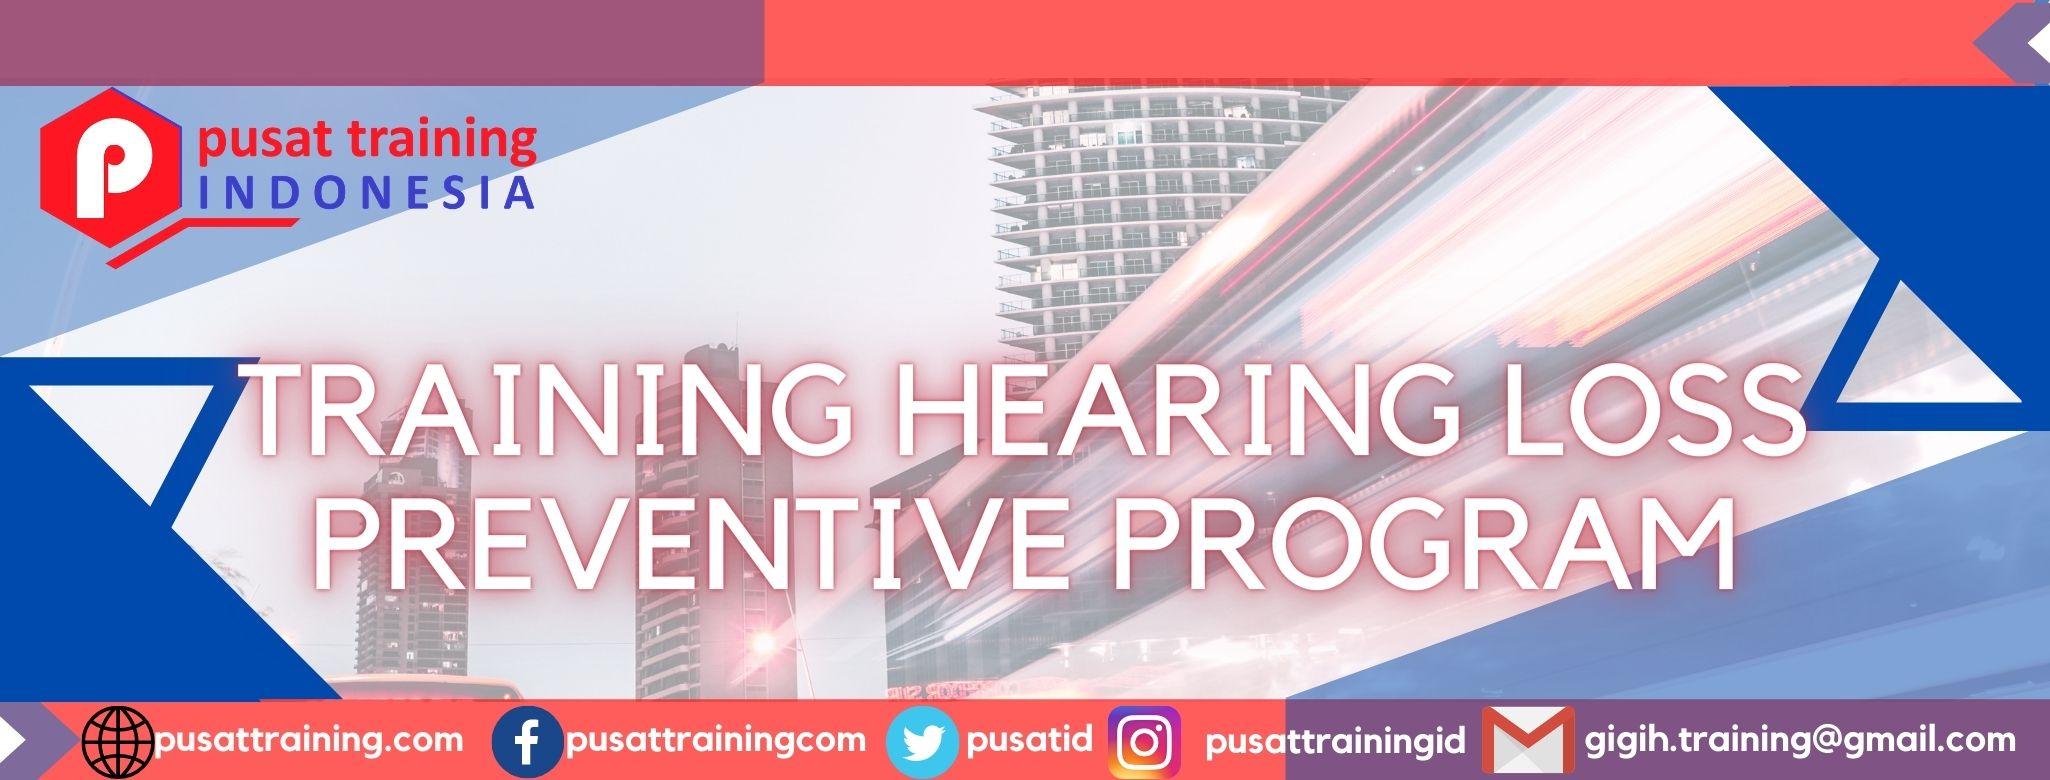 training-hearing-loss-preventive-program